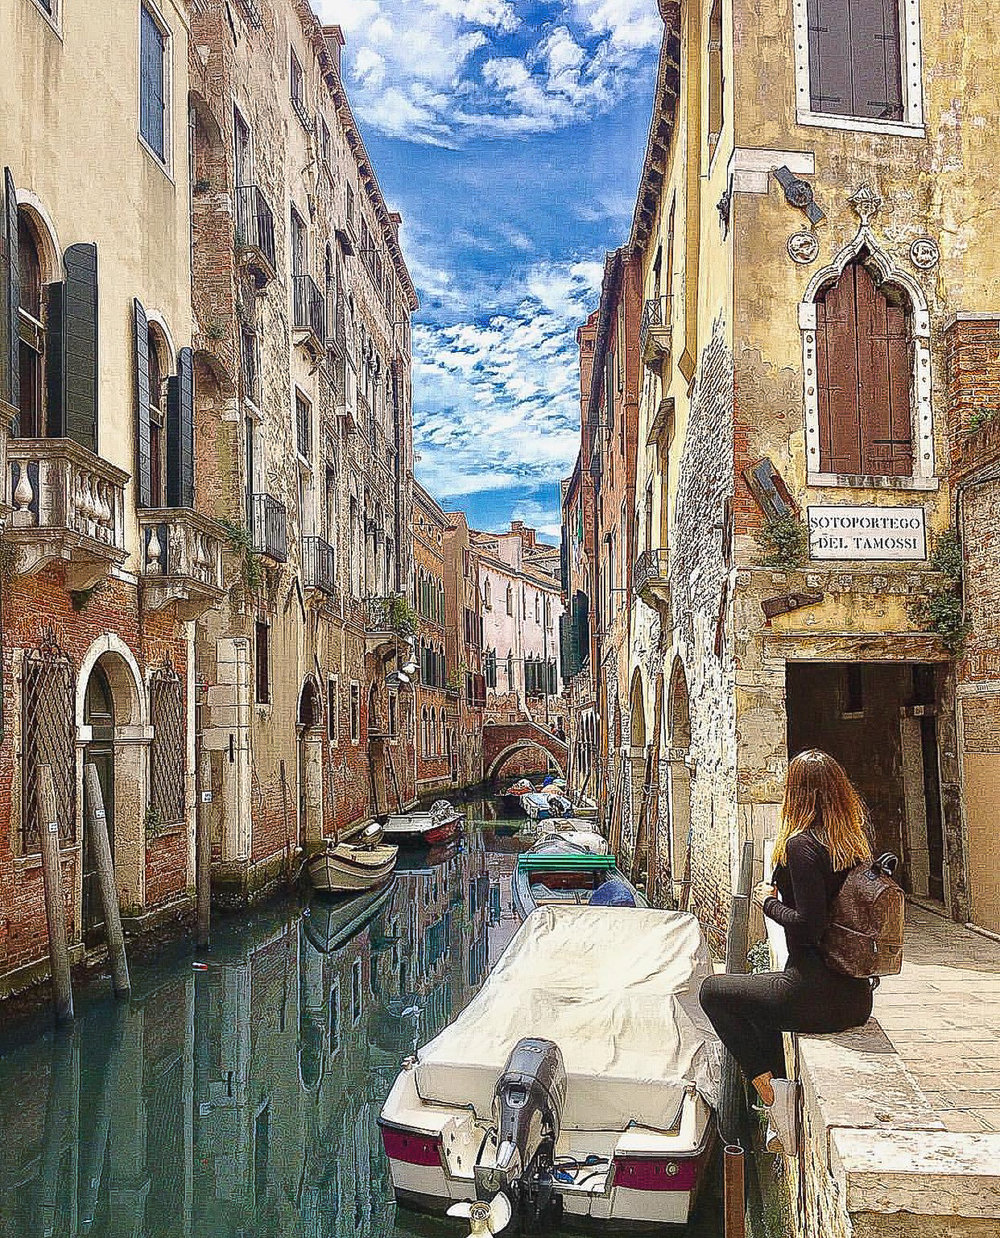 Beautiful Venice travels travel Photo by Linda Haggh.jpg